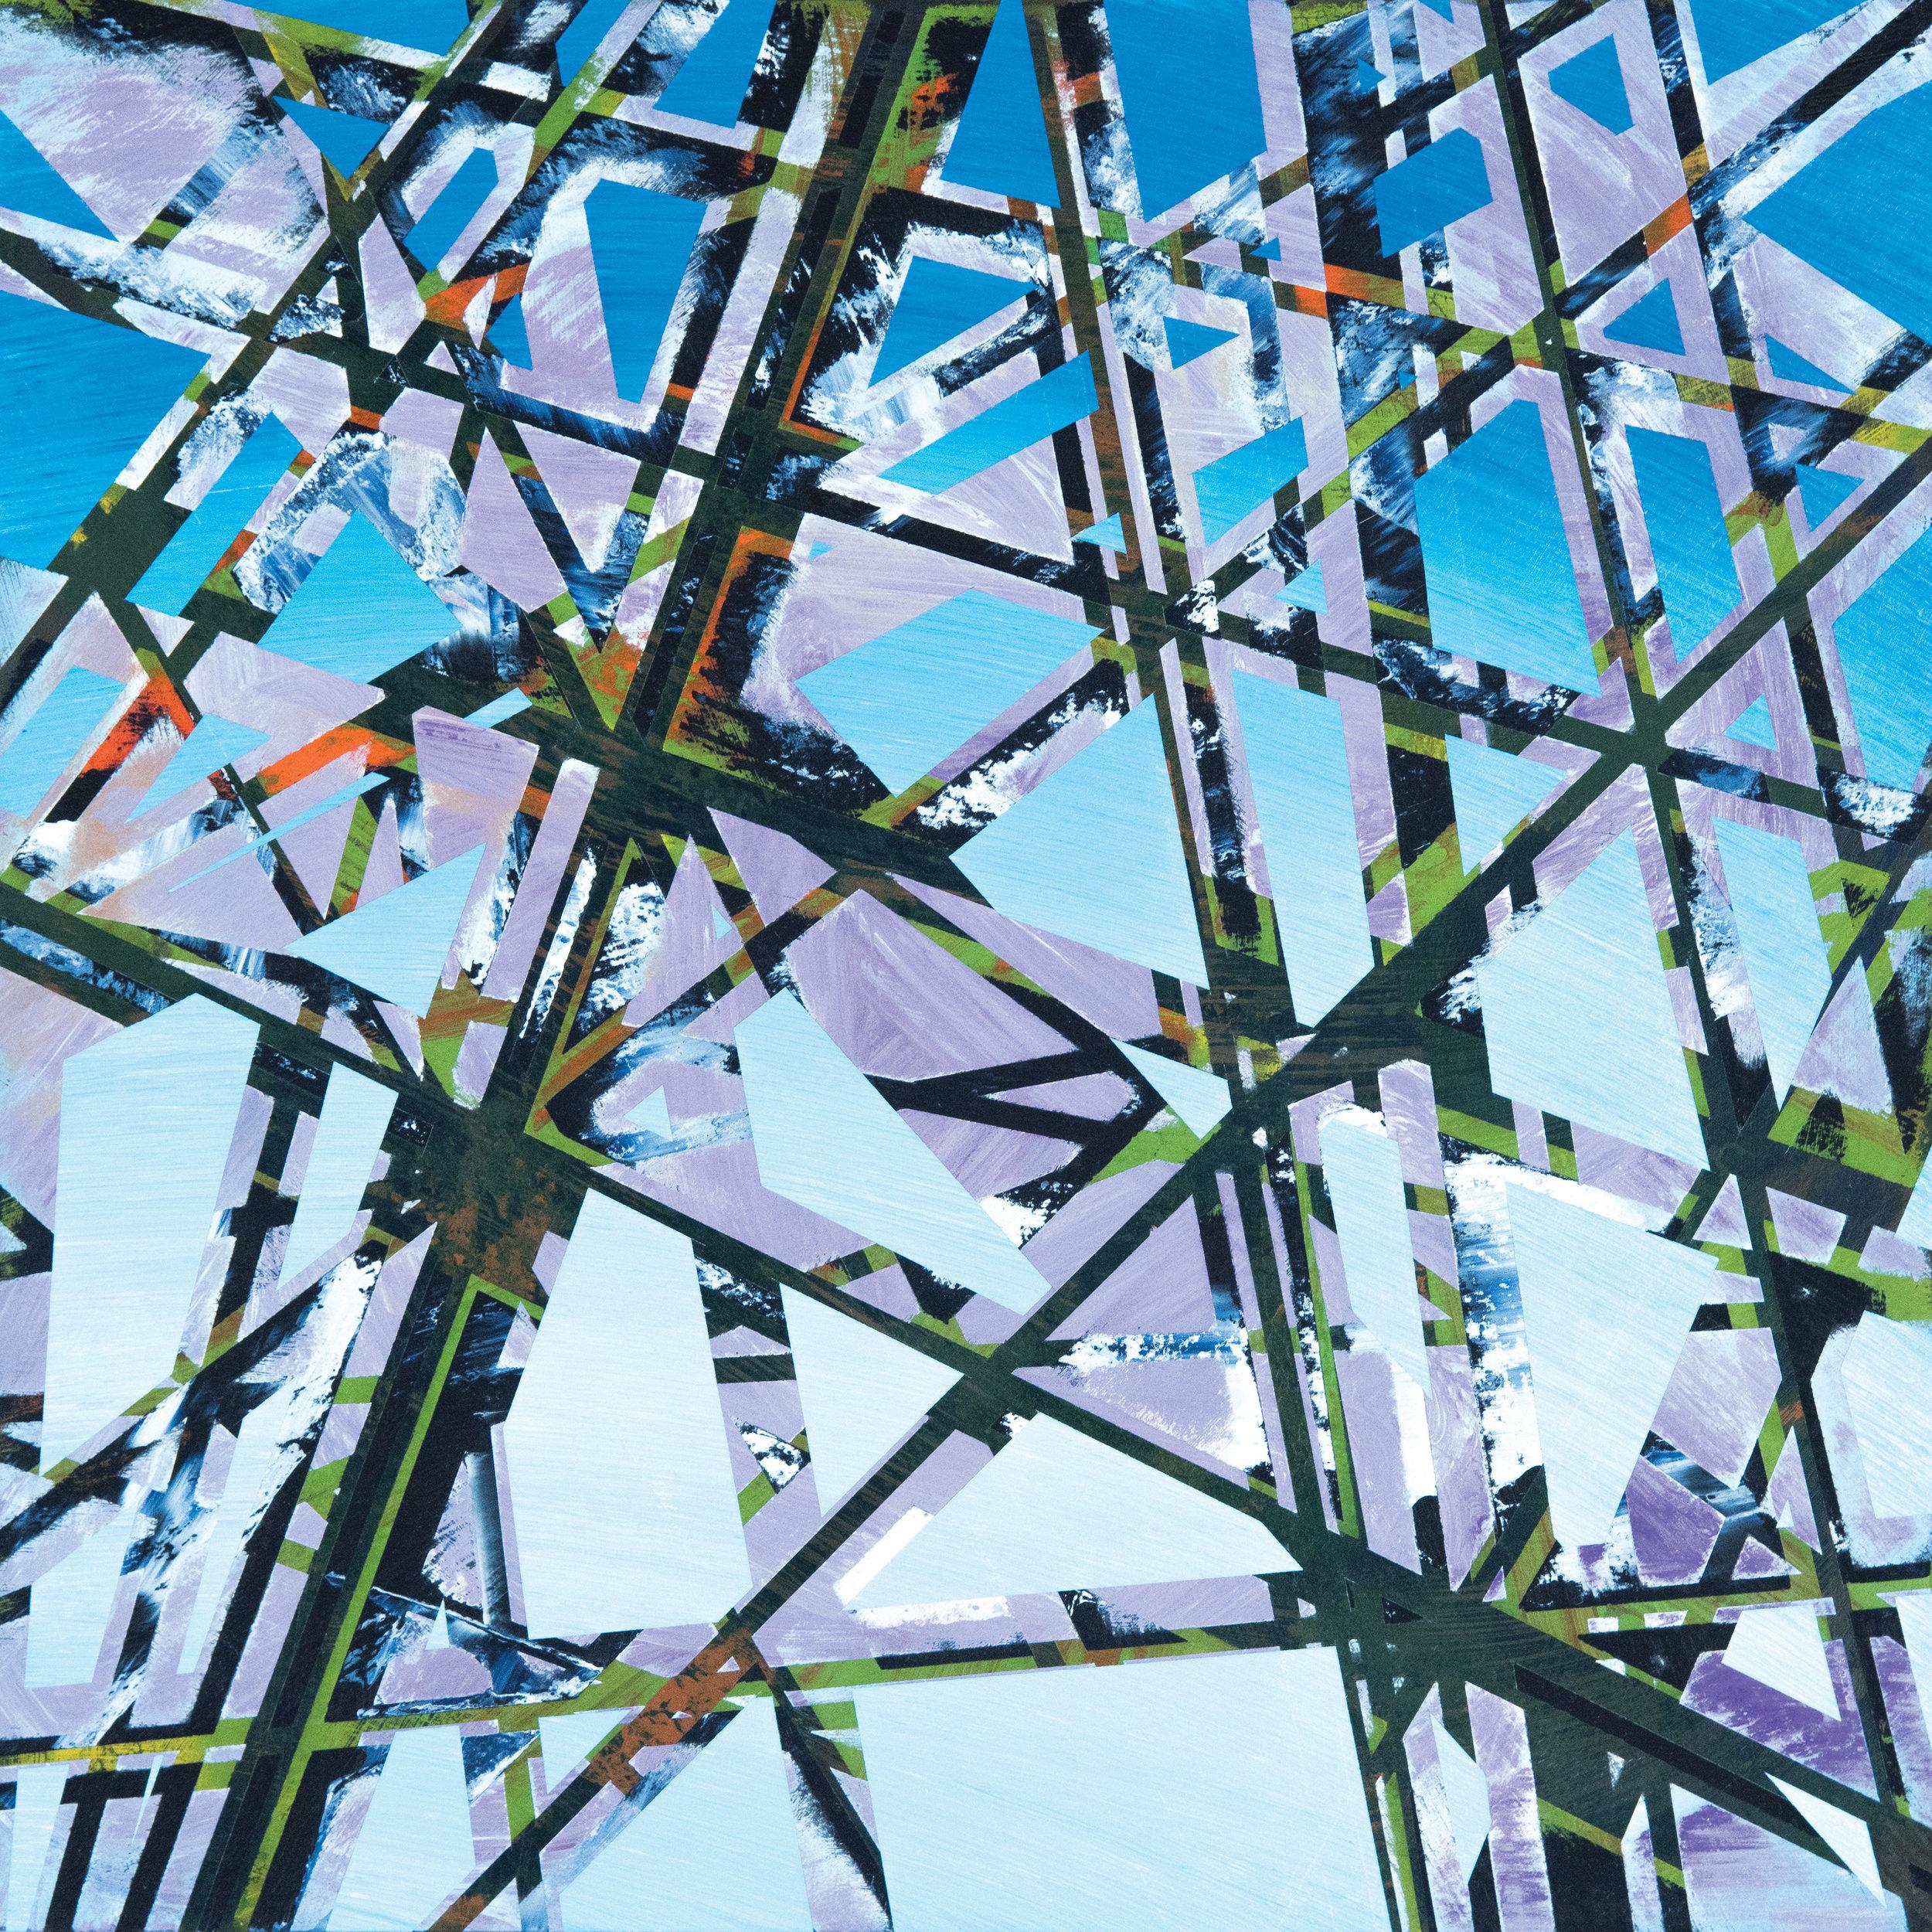 Daniel_Stuelpnagel-_Evolutionary_Convergence_-18x18_-acryliconwoodpanel-2019-$600.jpg